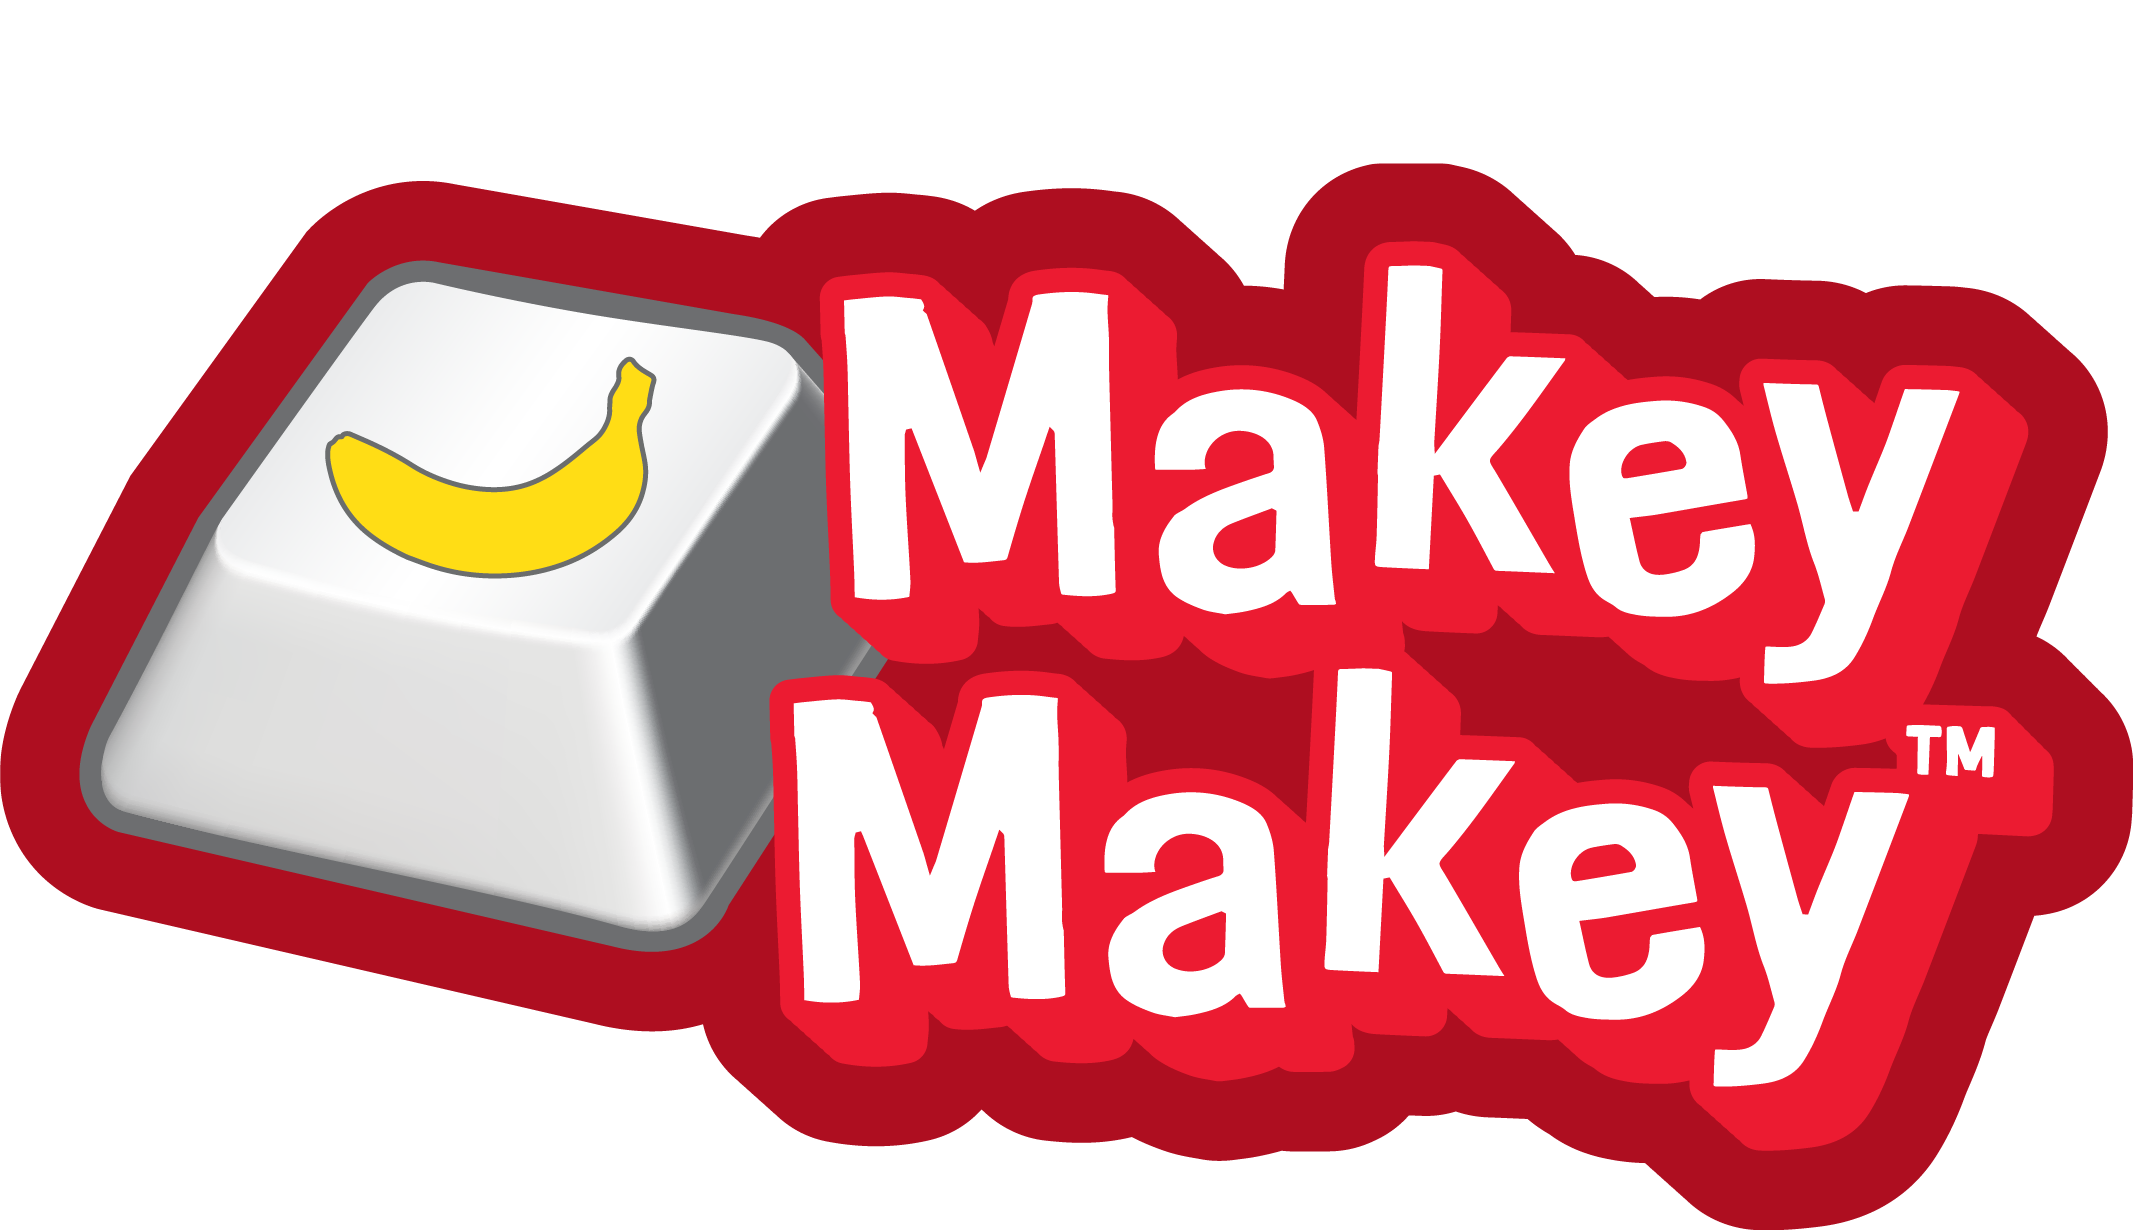 Whack a Mole and Makey Makey